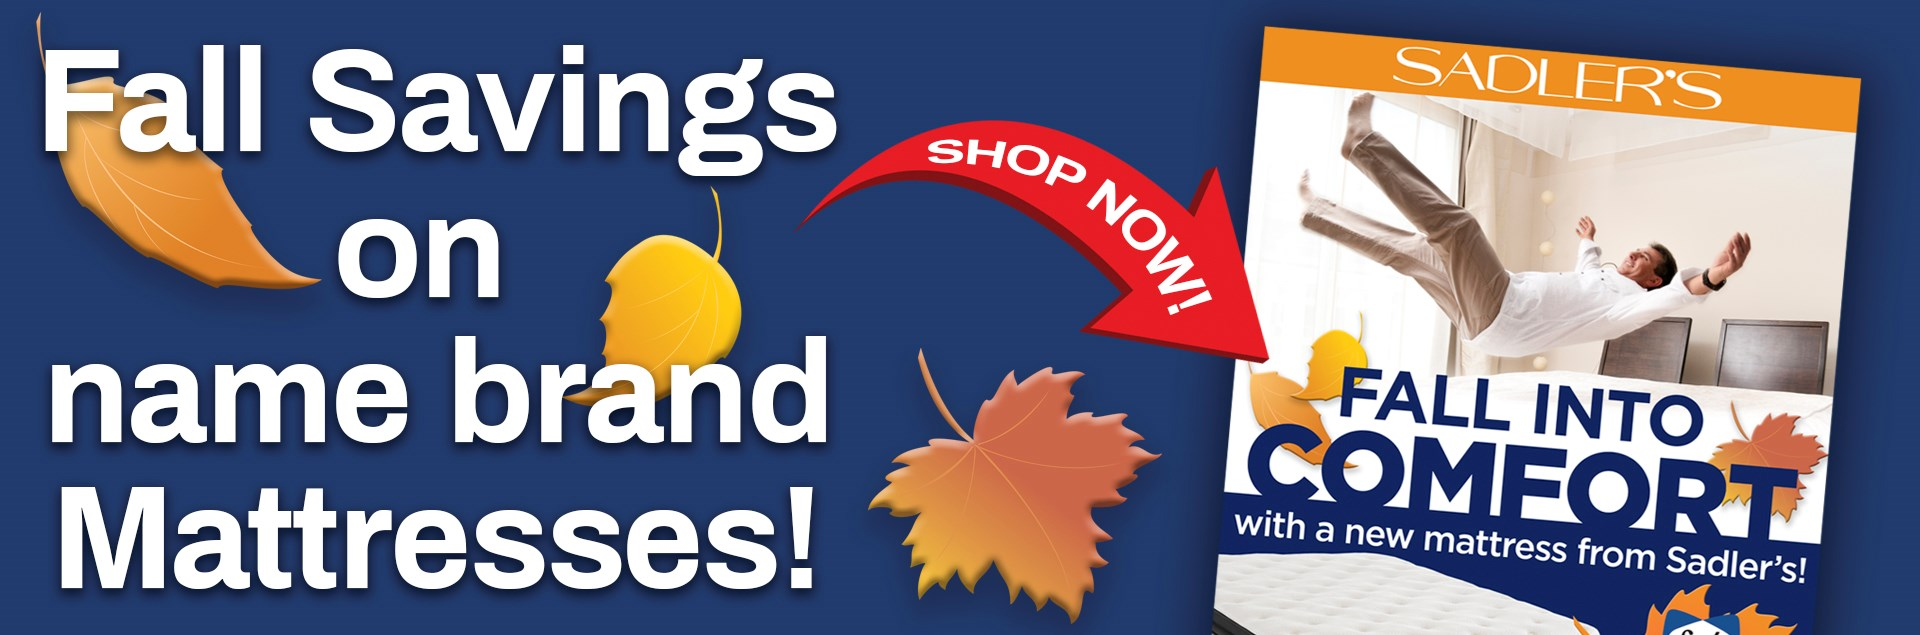 Fall Mattress Sale